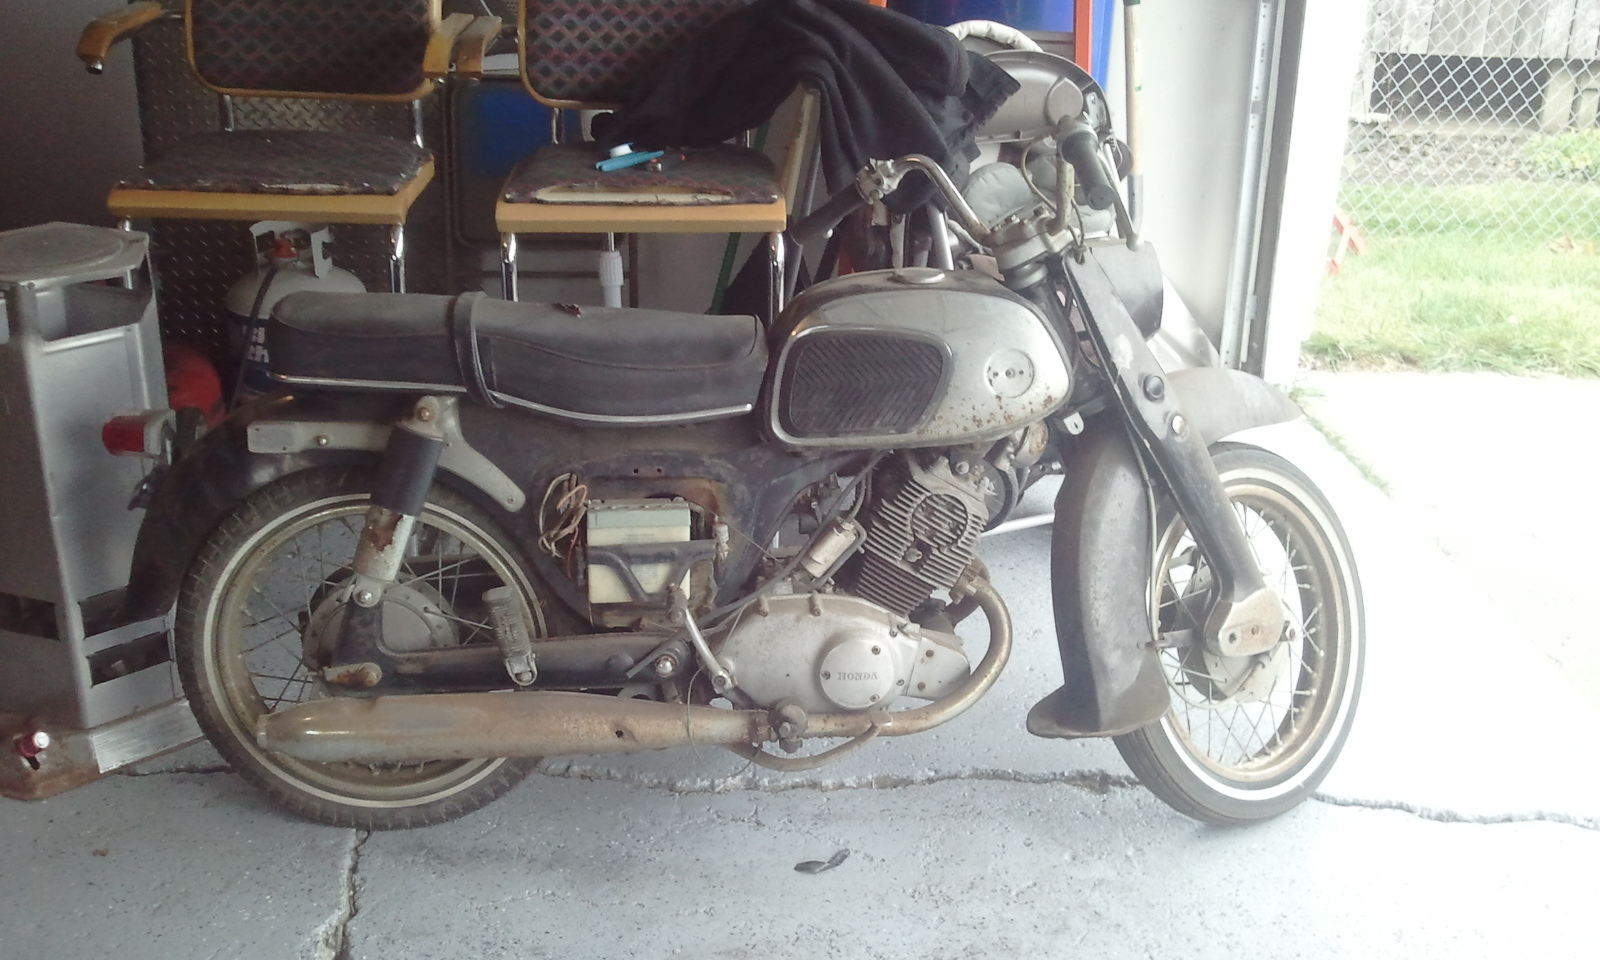 help what is this bike rh hondatwins net Honda CA95 Motorcycle Honda CA95 Parts